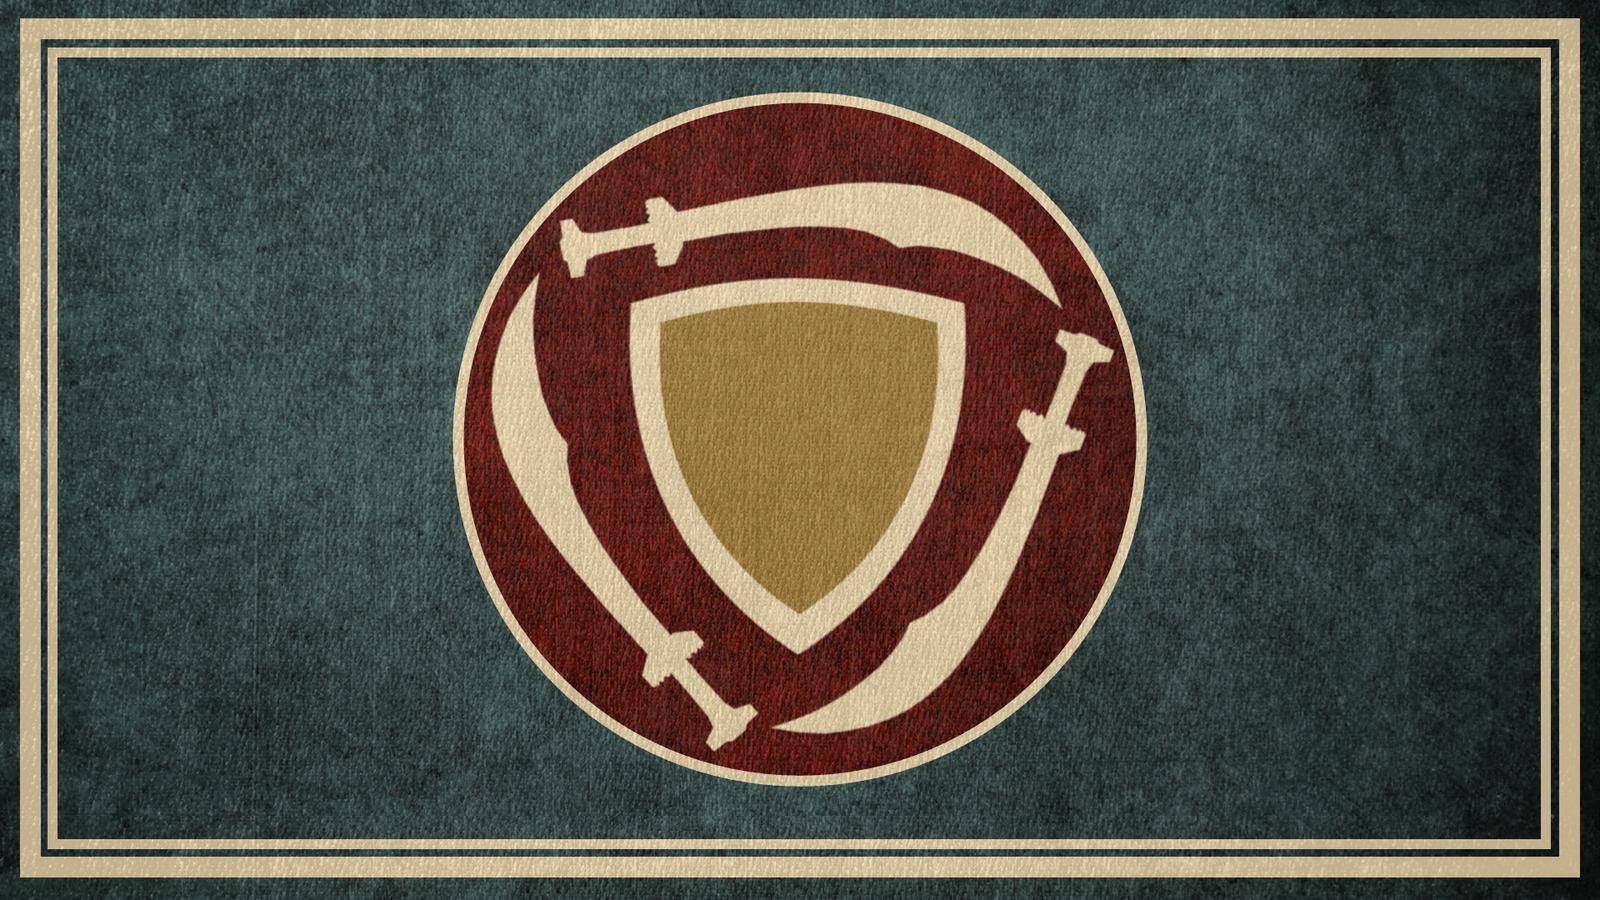 The Elder Scrolls: Flag of Hammerfell by okiir